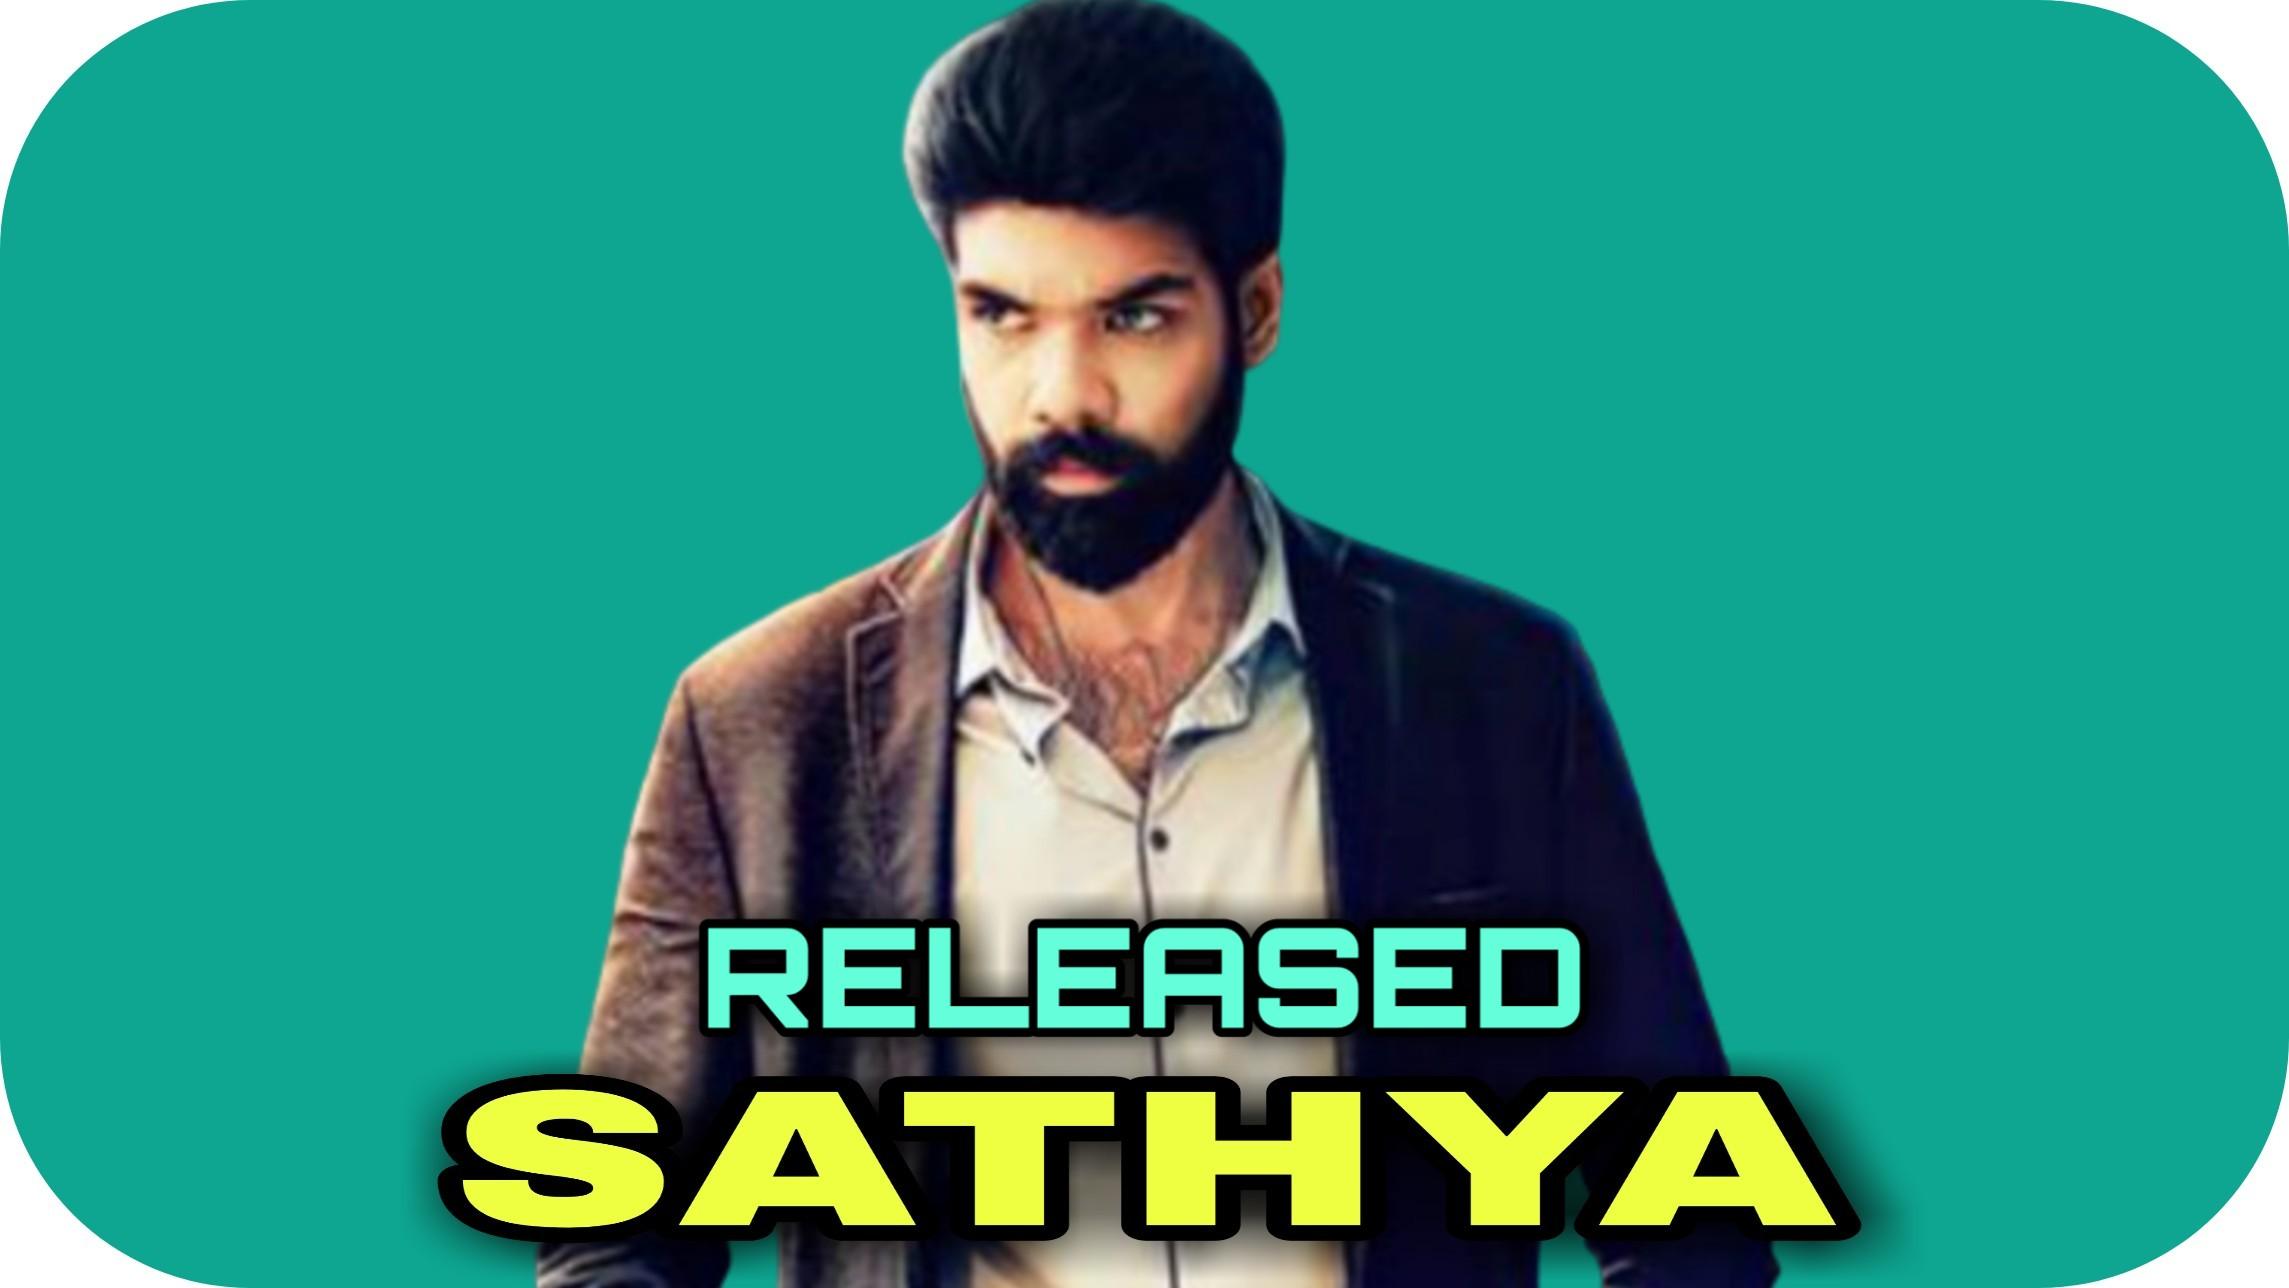 Sathya (2020) Hindi Dubbed Movie